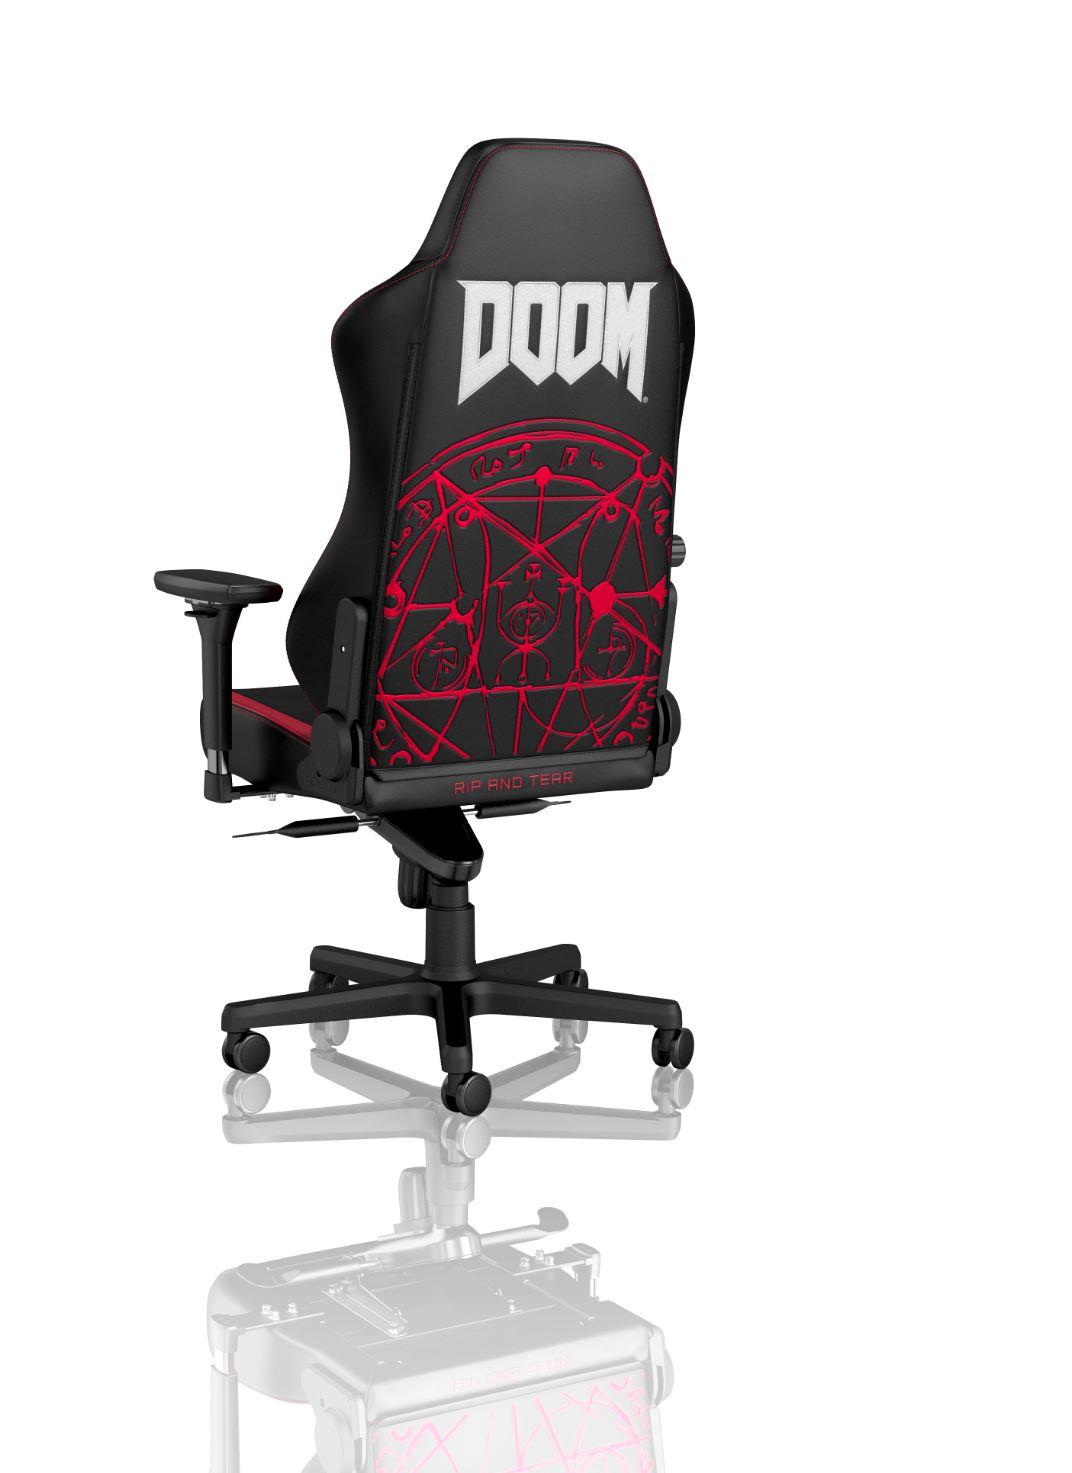 Doom-Chaise-Noblechair2